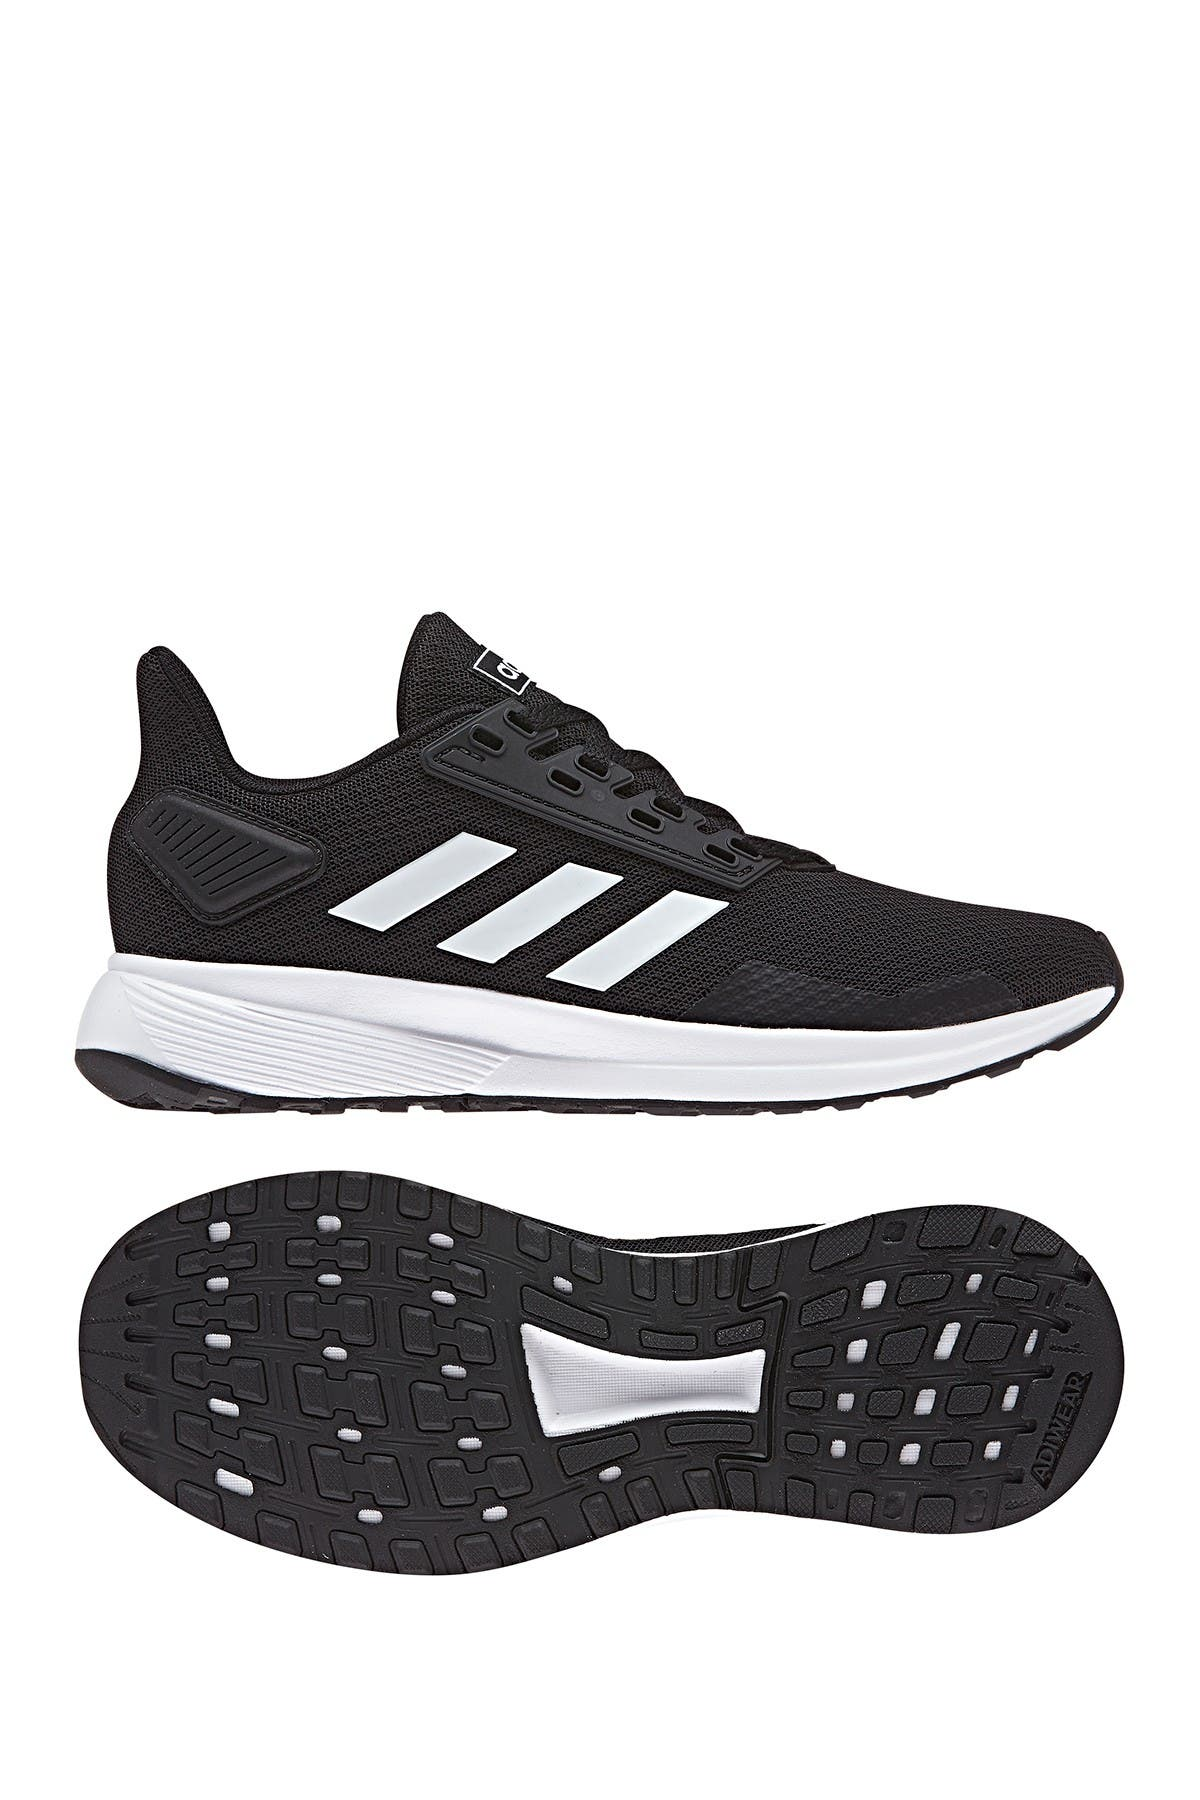 adidas | Duramo 9 Sneaker | Nordstrom Rack